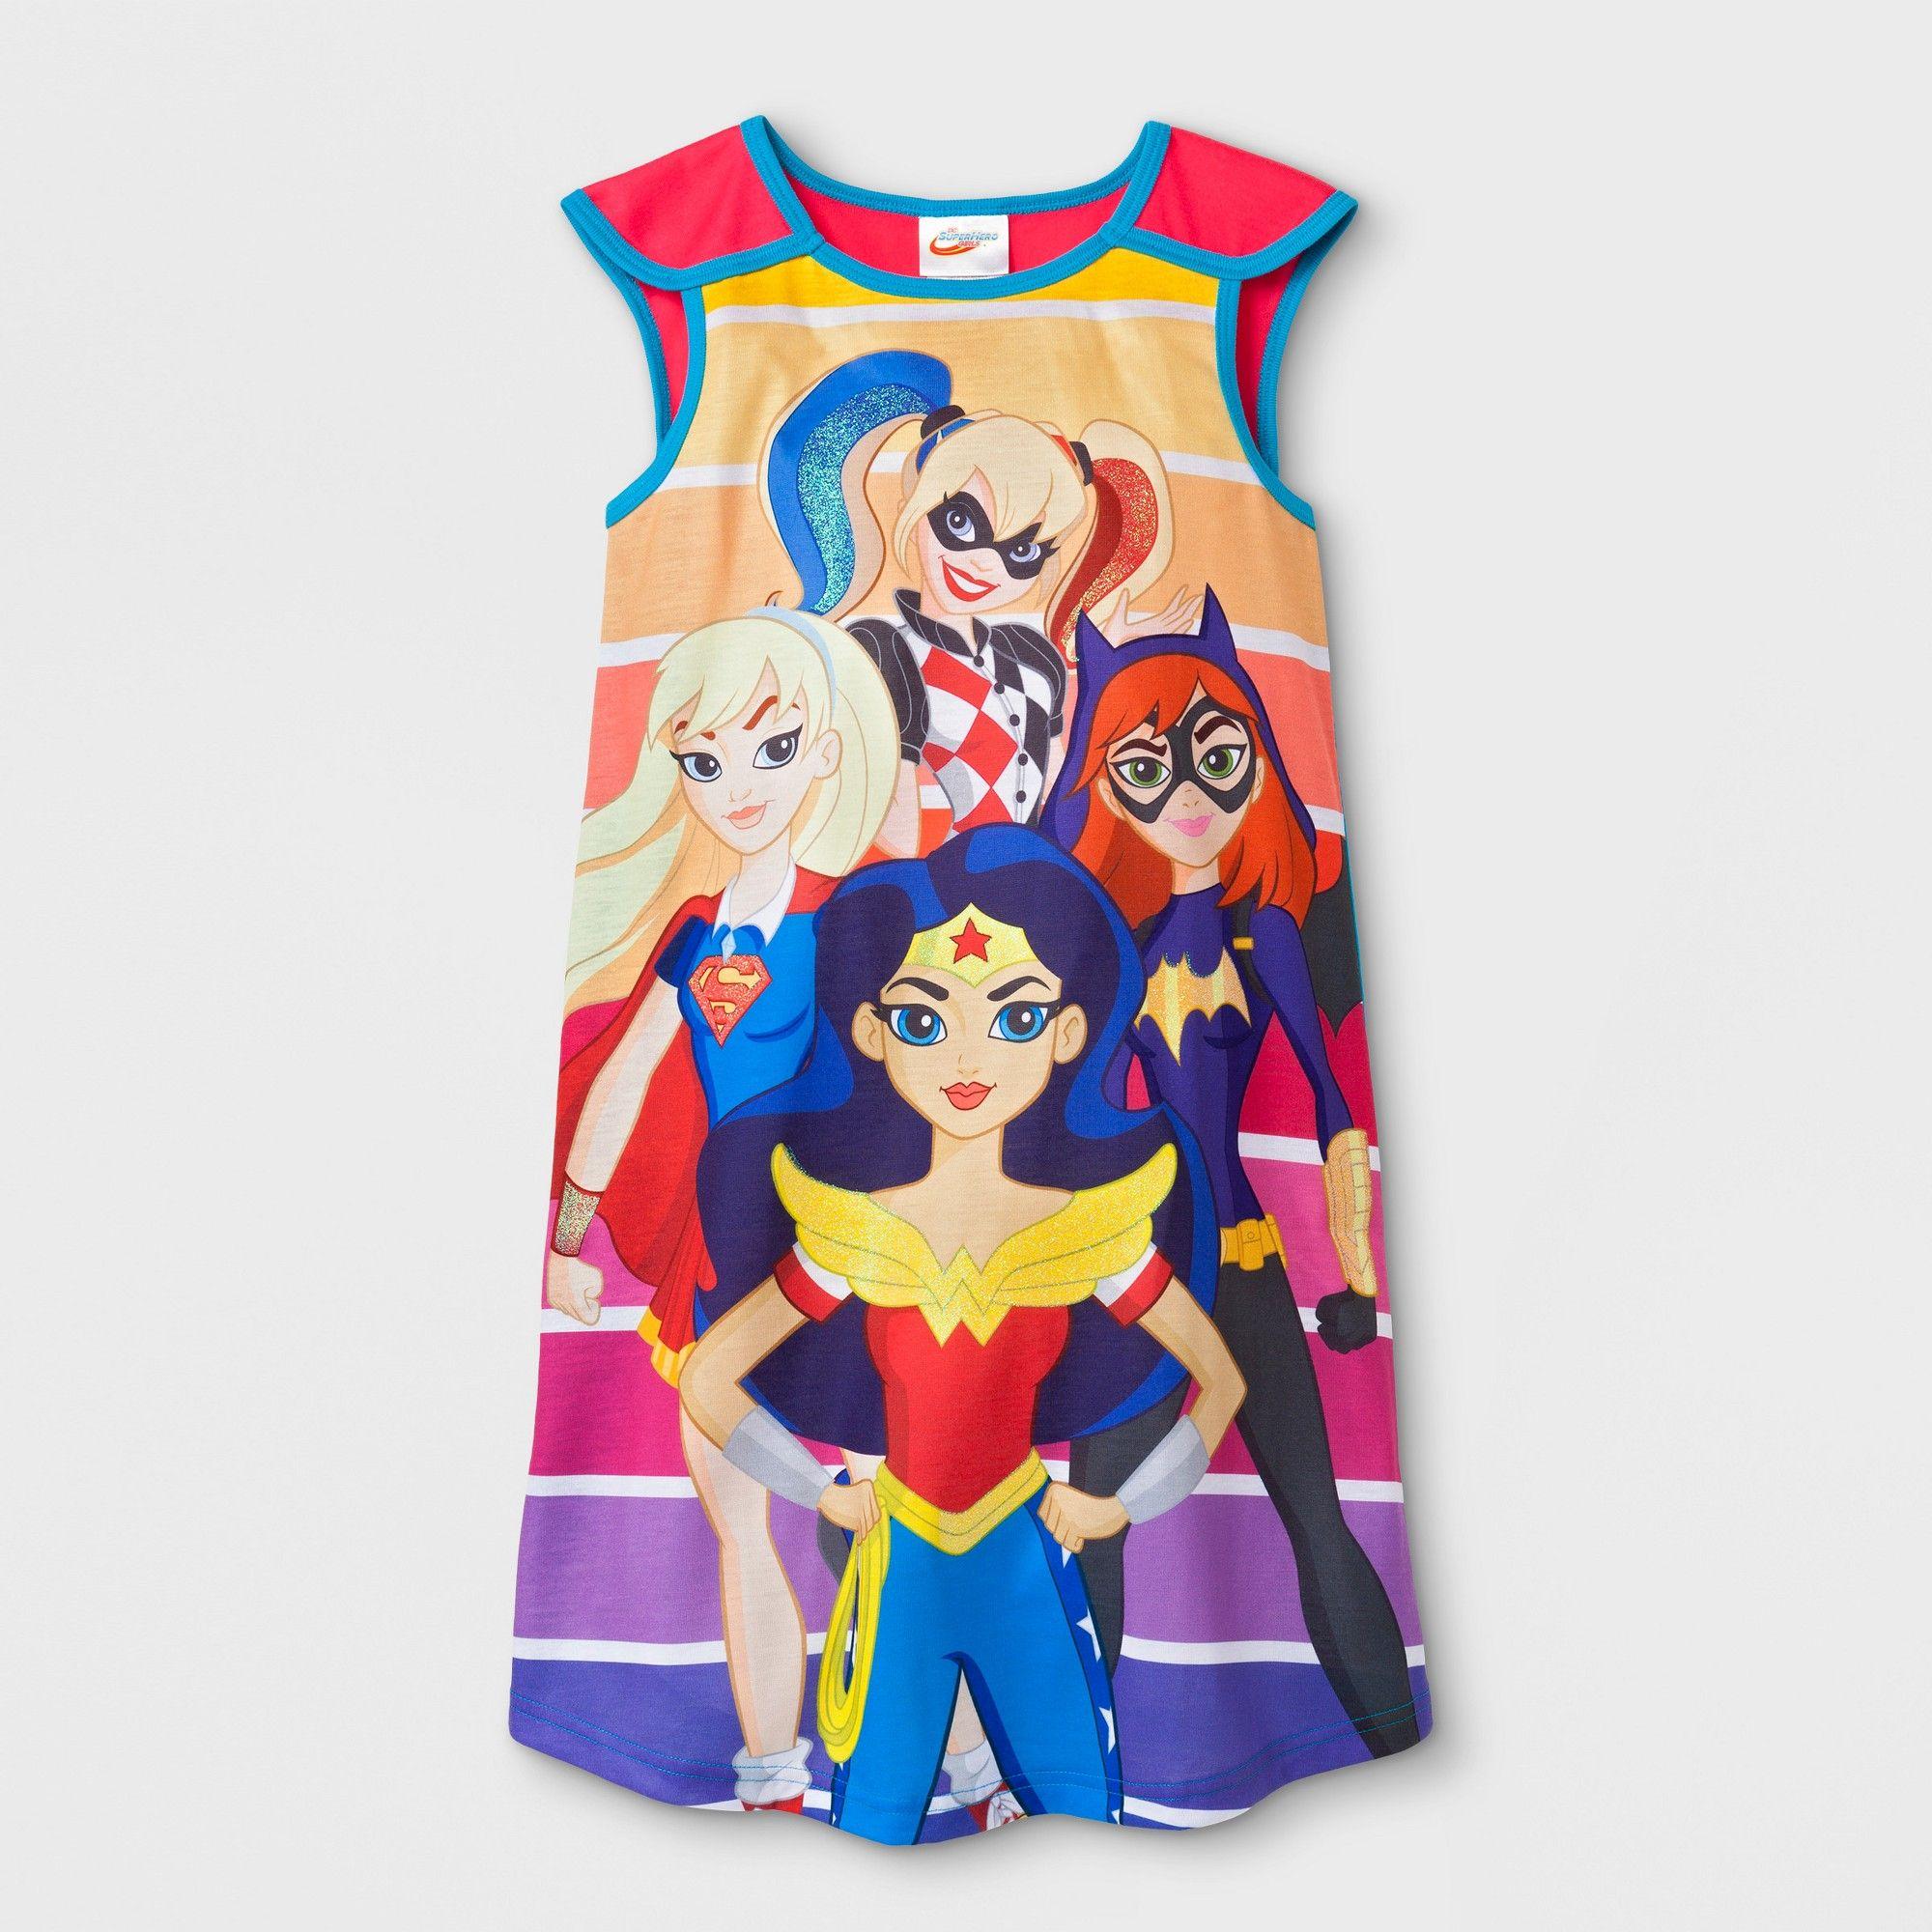 06164bcc946 Girls' DC Super Hero Girls Sleeveless Nightgown - XS, Multicolored ...